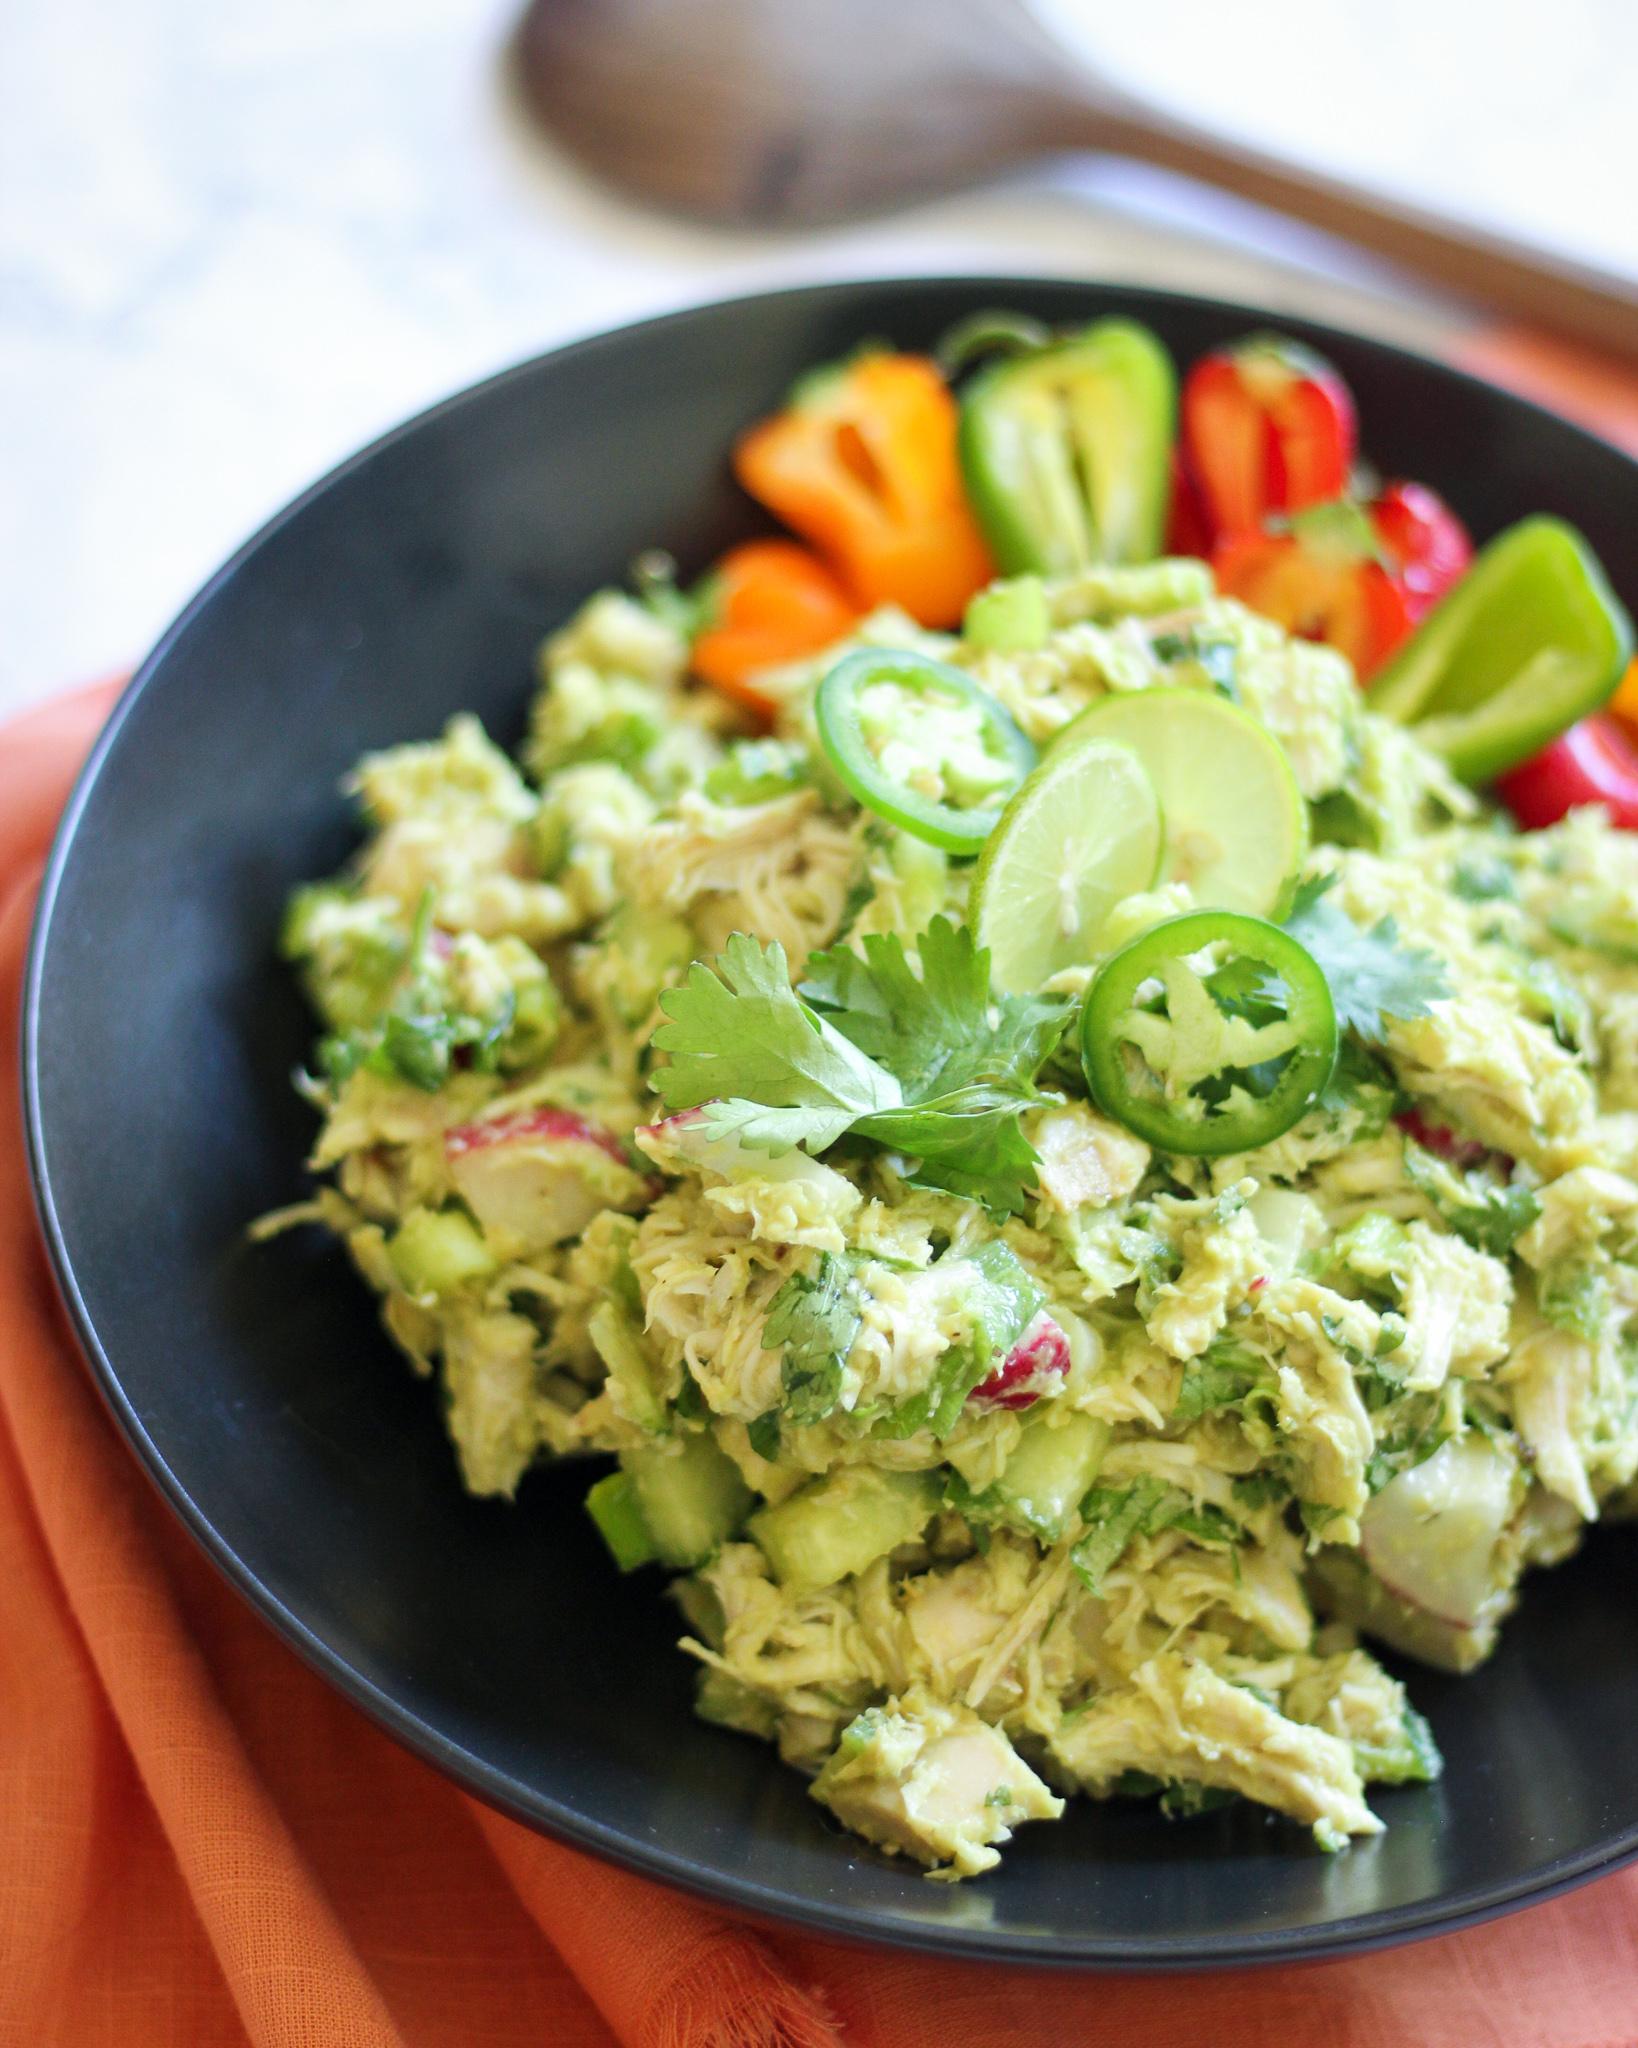 The Best No Mayo Avocado Chicken Salad